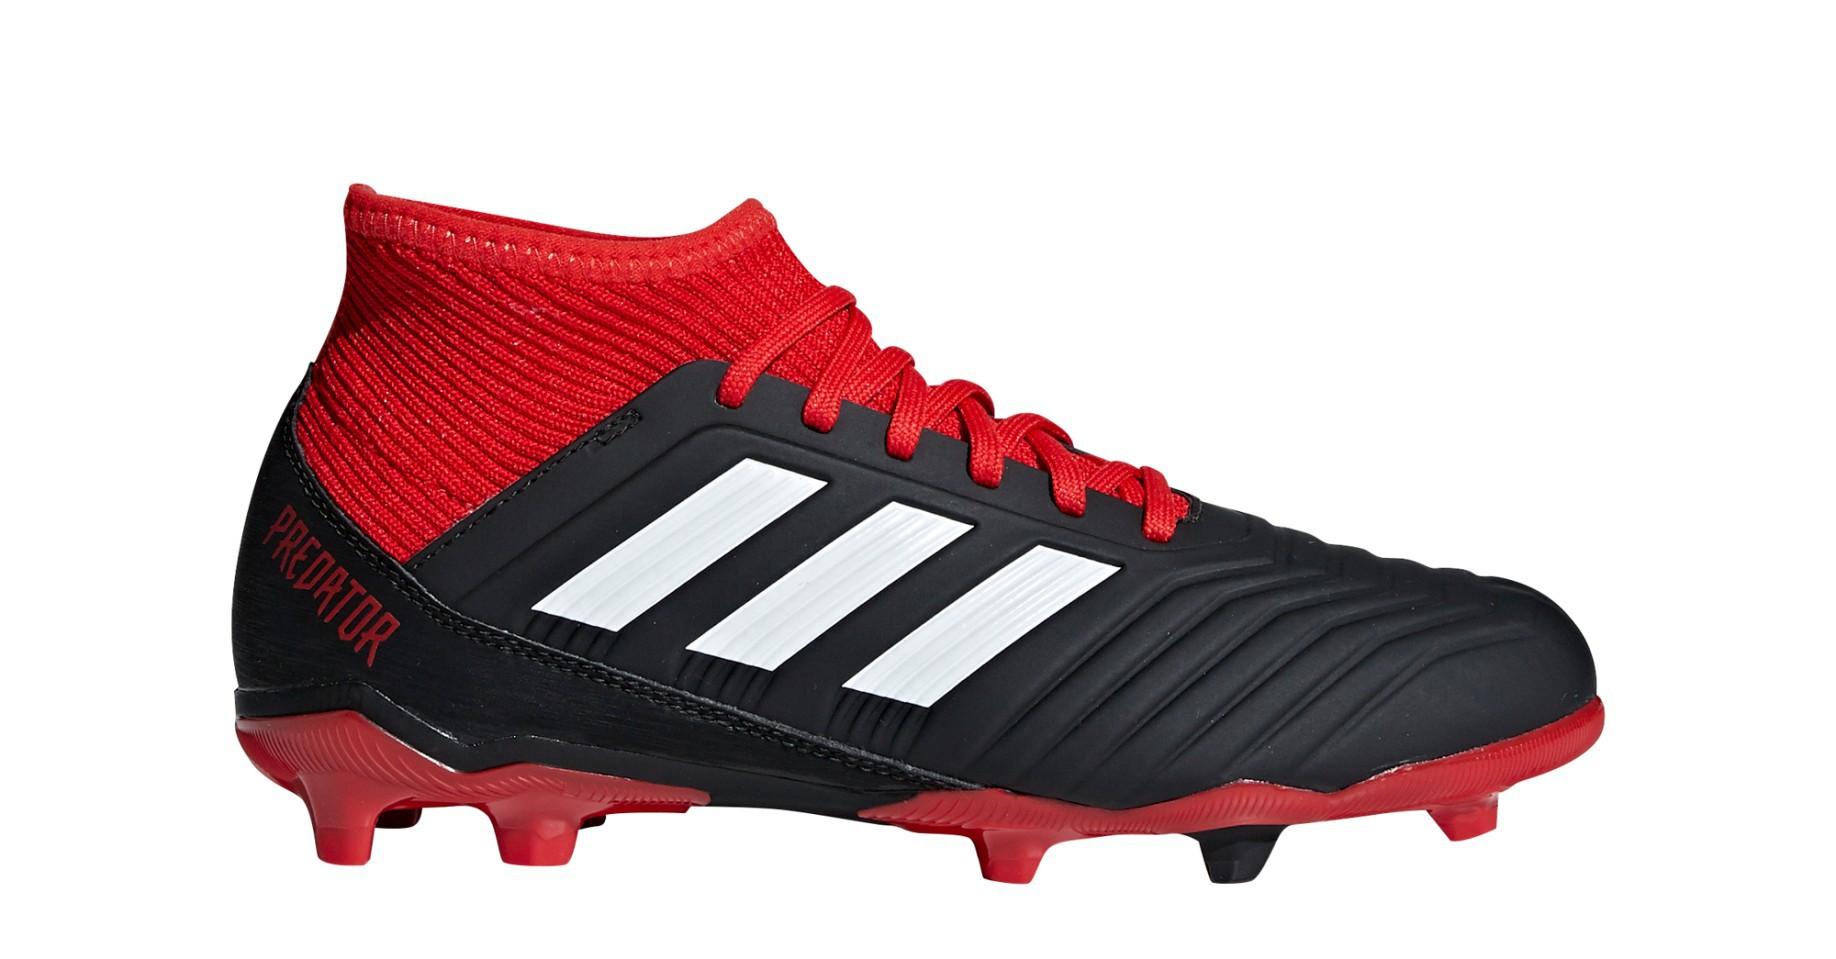 Football boots Adidas Predator 18.3 FG Team Mode Pack